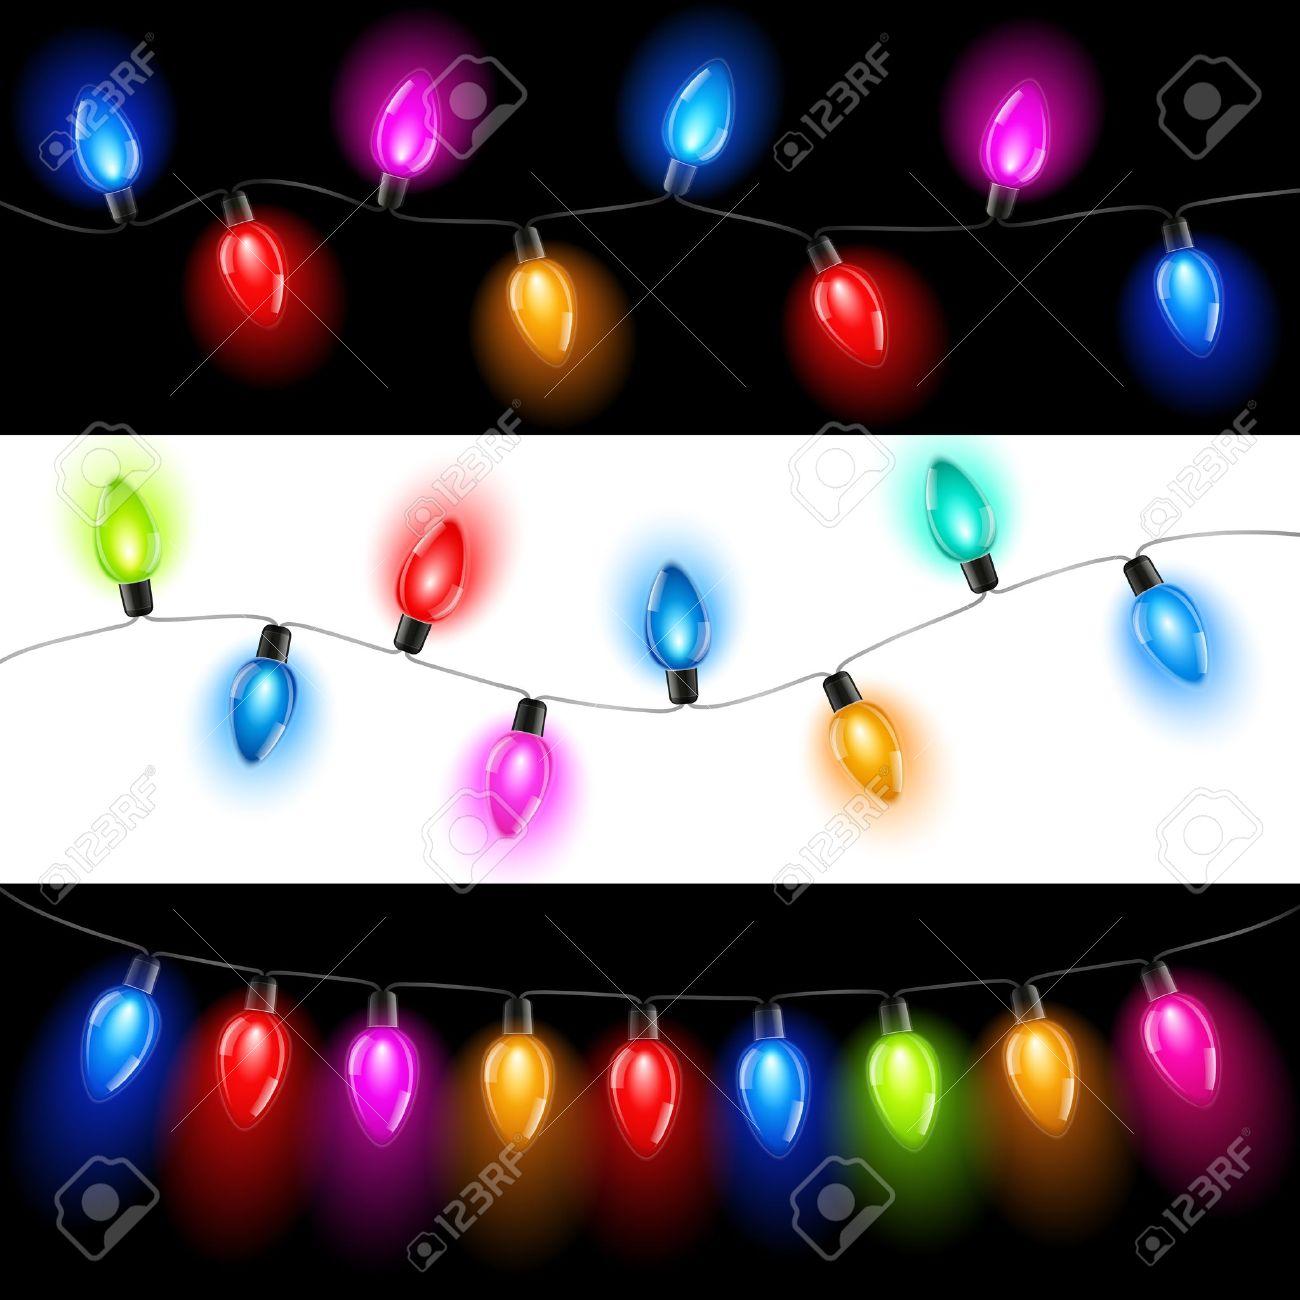 decorative string lights christmas lights - Decorative String Lights